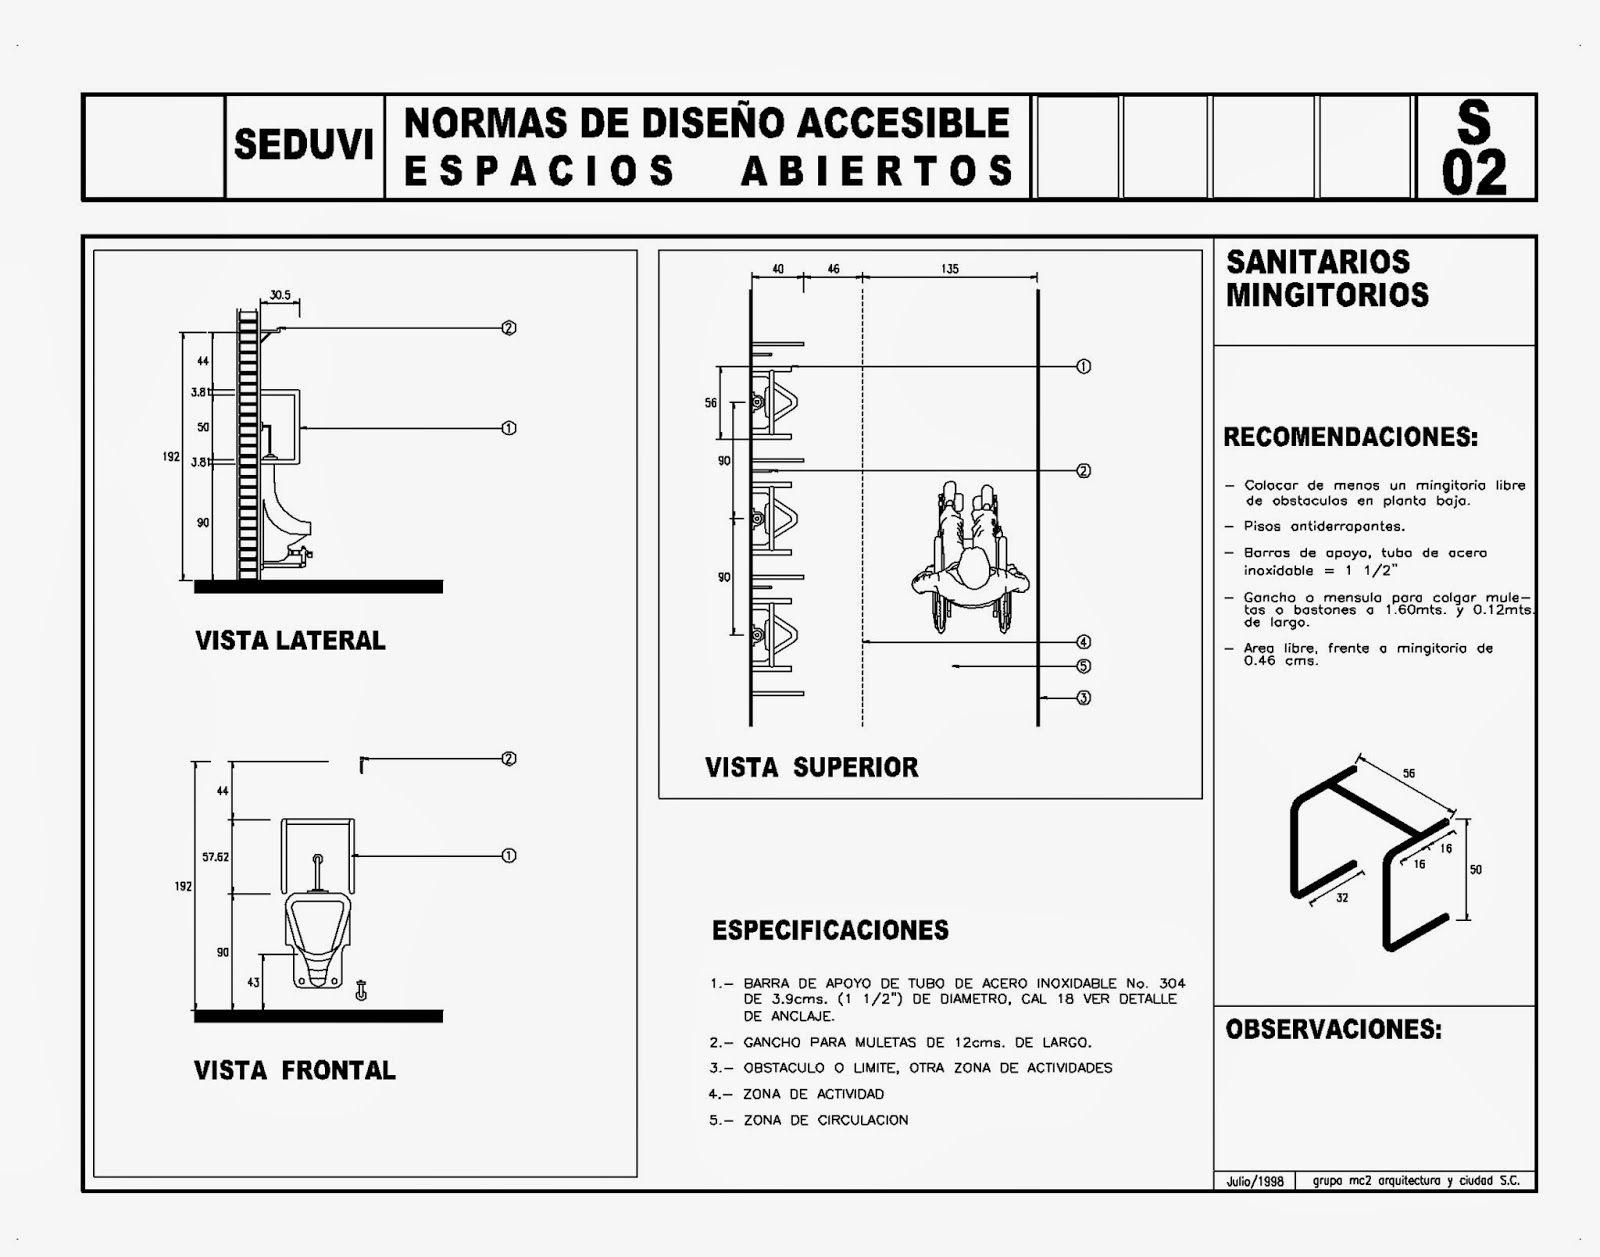 Ba o discapacitados bloque cad todo para el arqui normas dise o discapacitados 5 seduvi - Bloques autocad banos ...